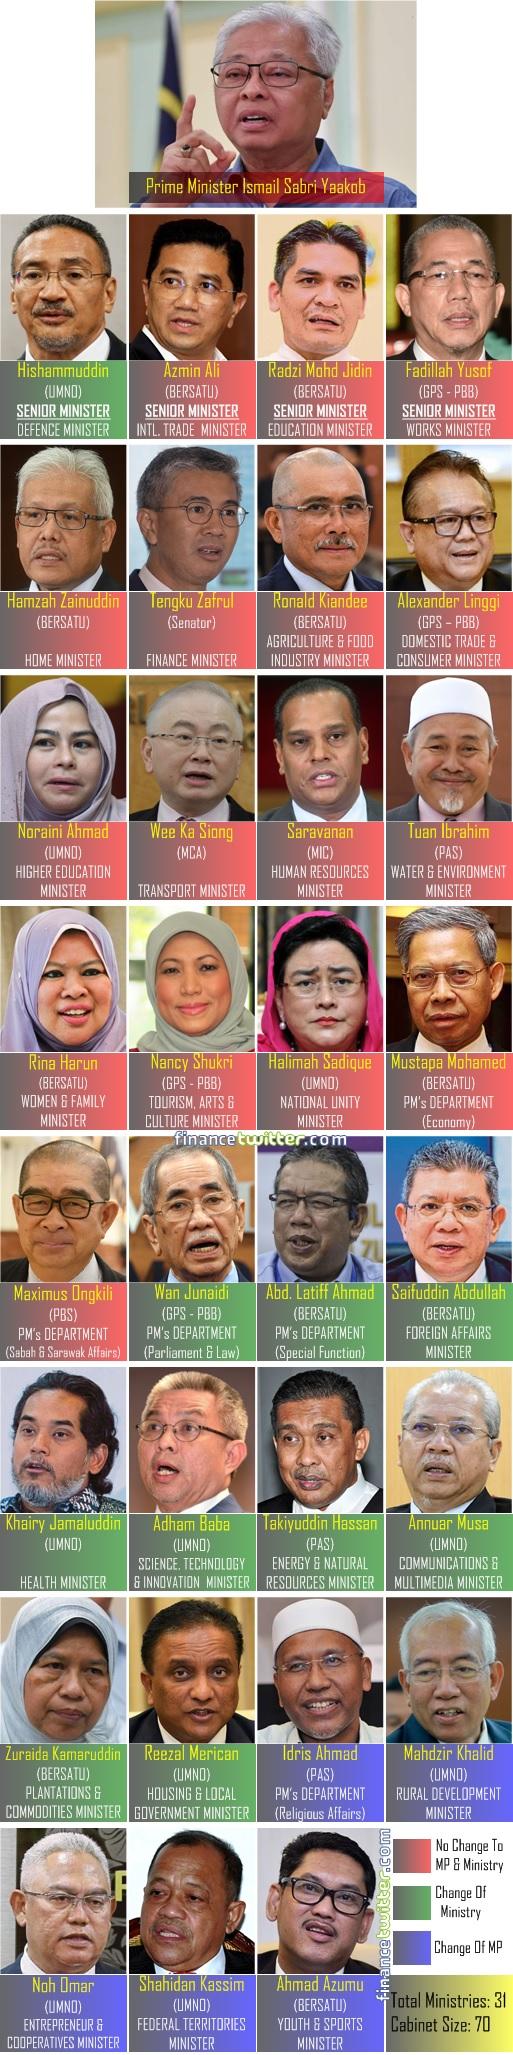 Prime Minister Ismail Sabri Cabinet - 2021